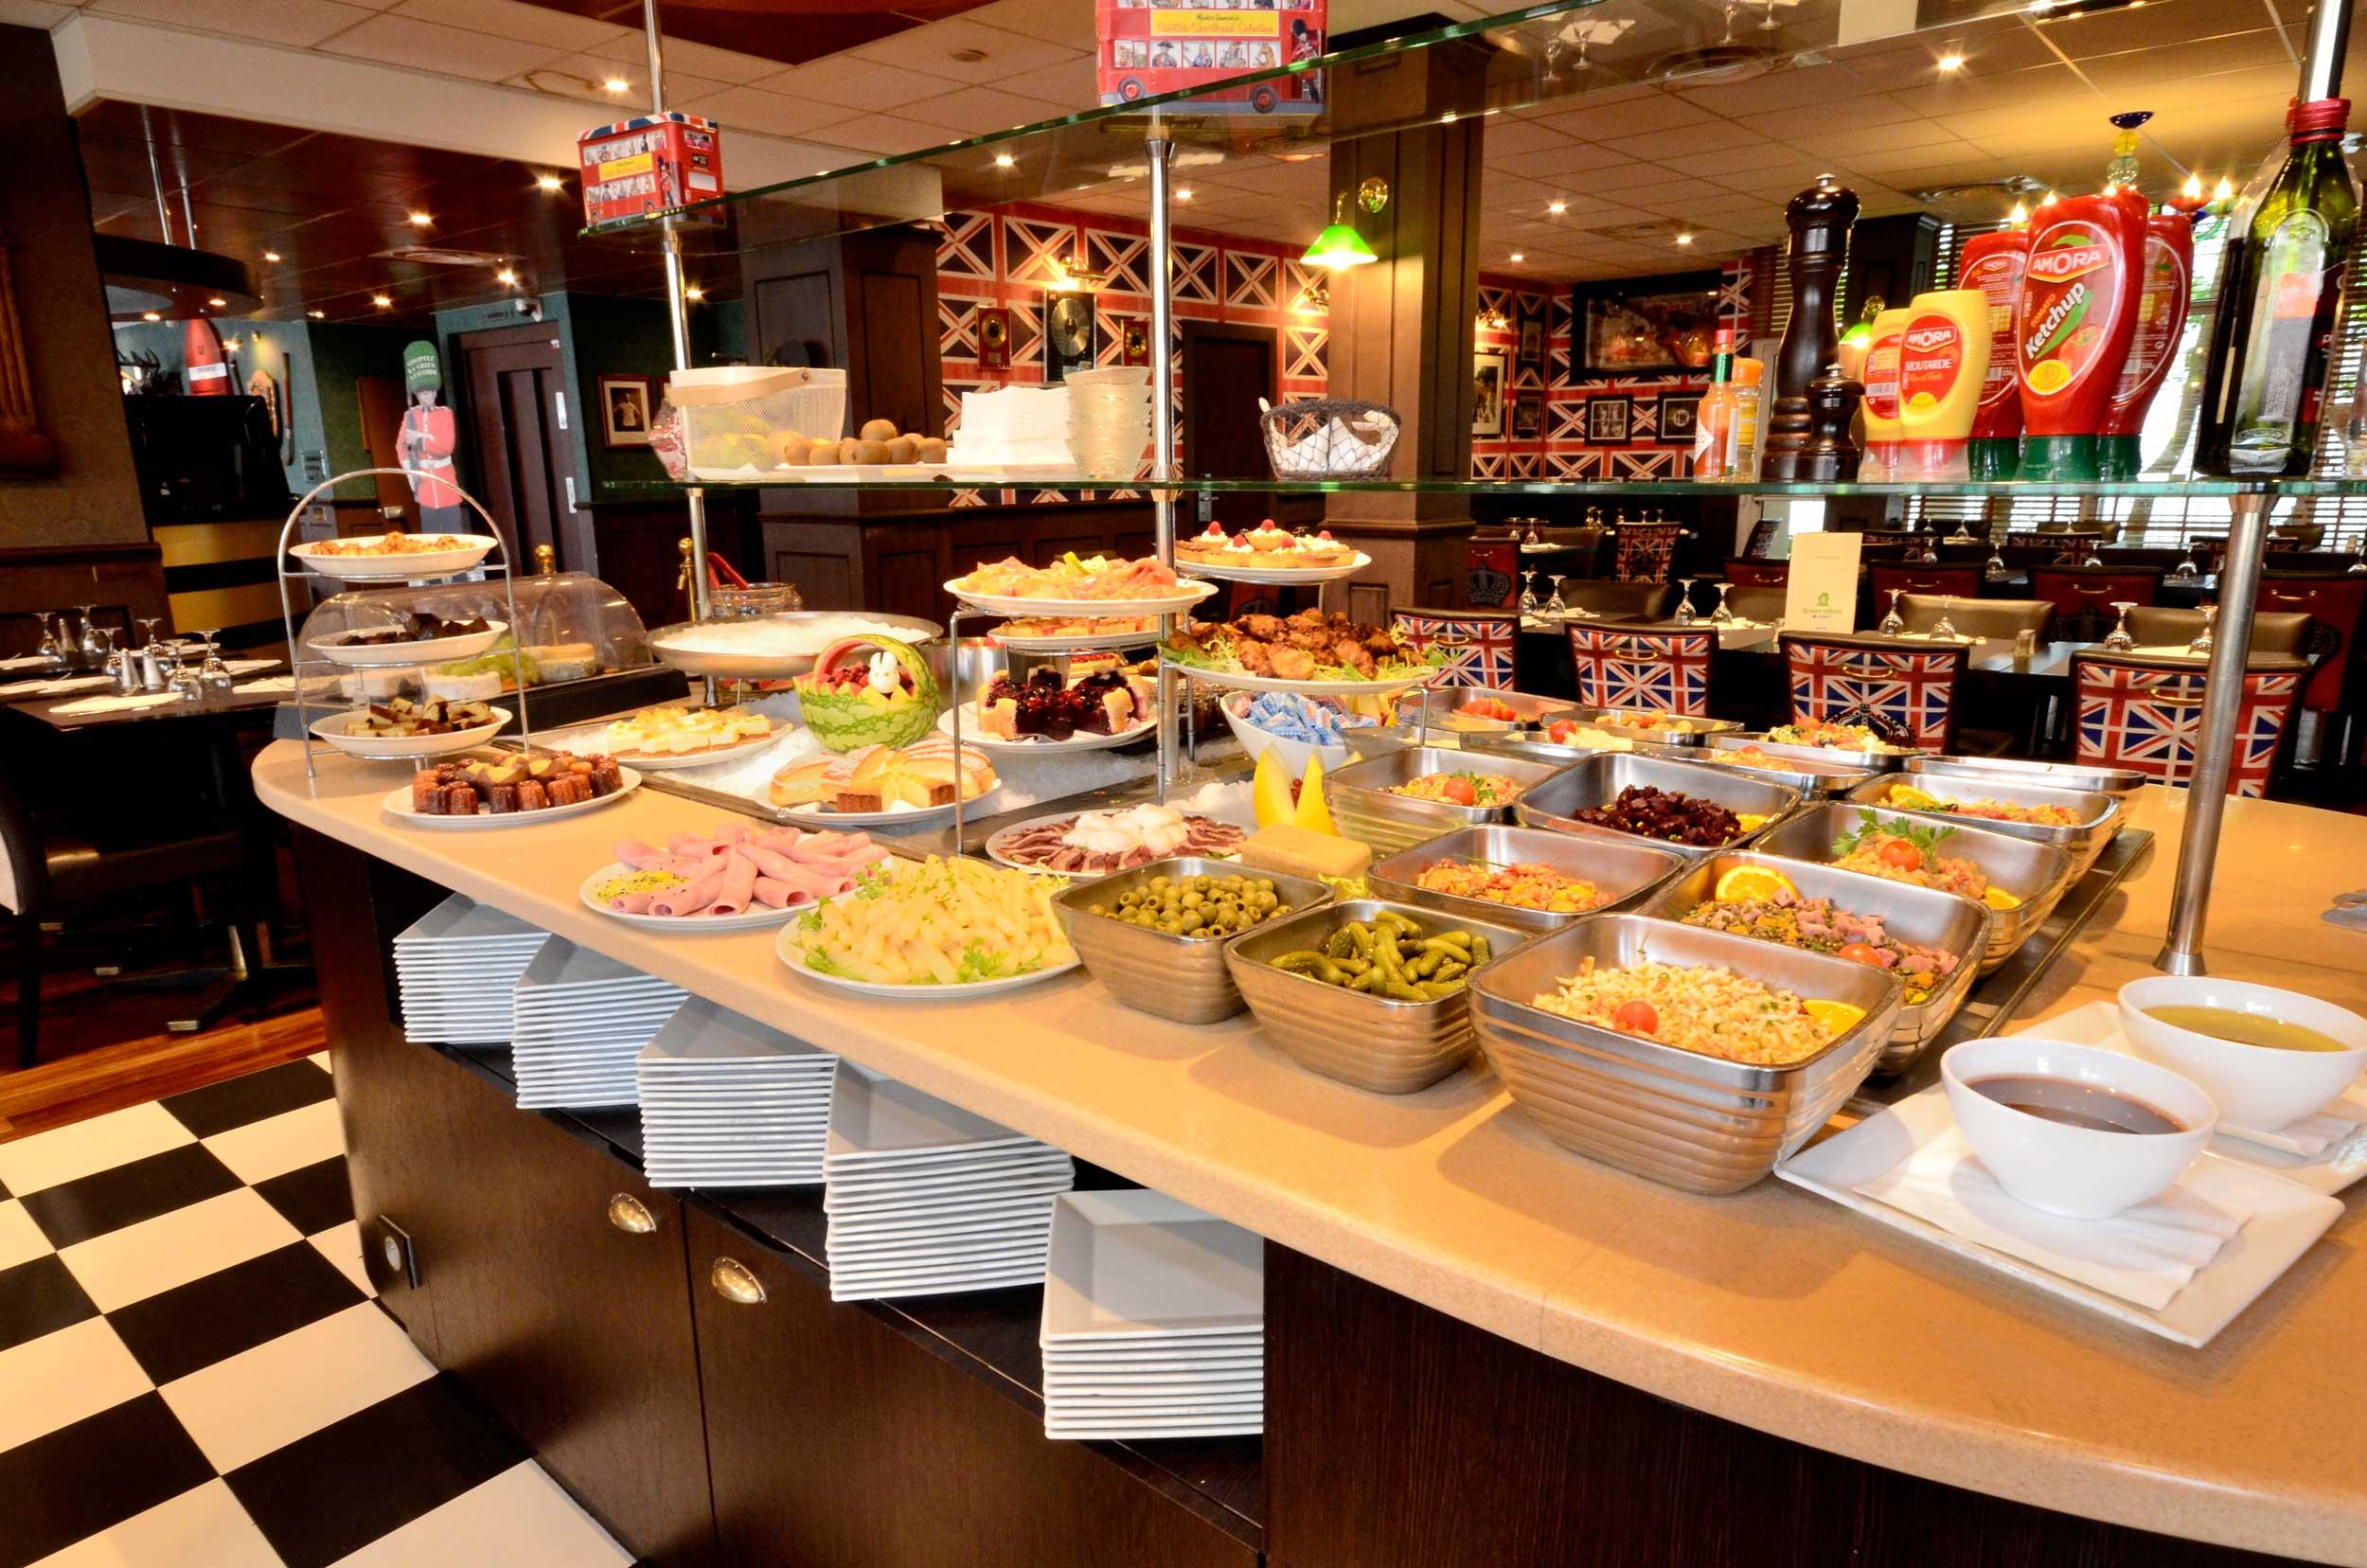 Greenhotels_roissy-parc-des-expositions_restaurant